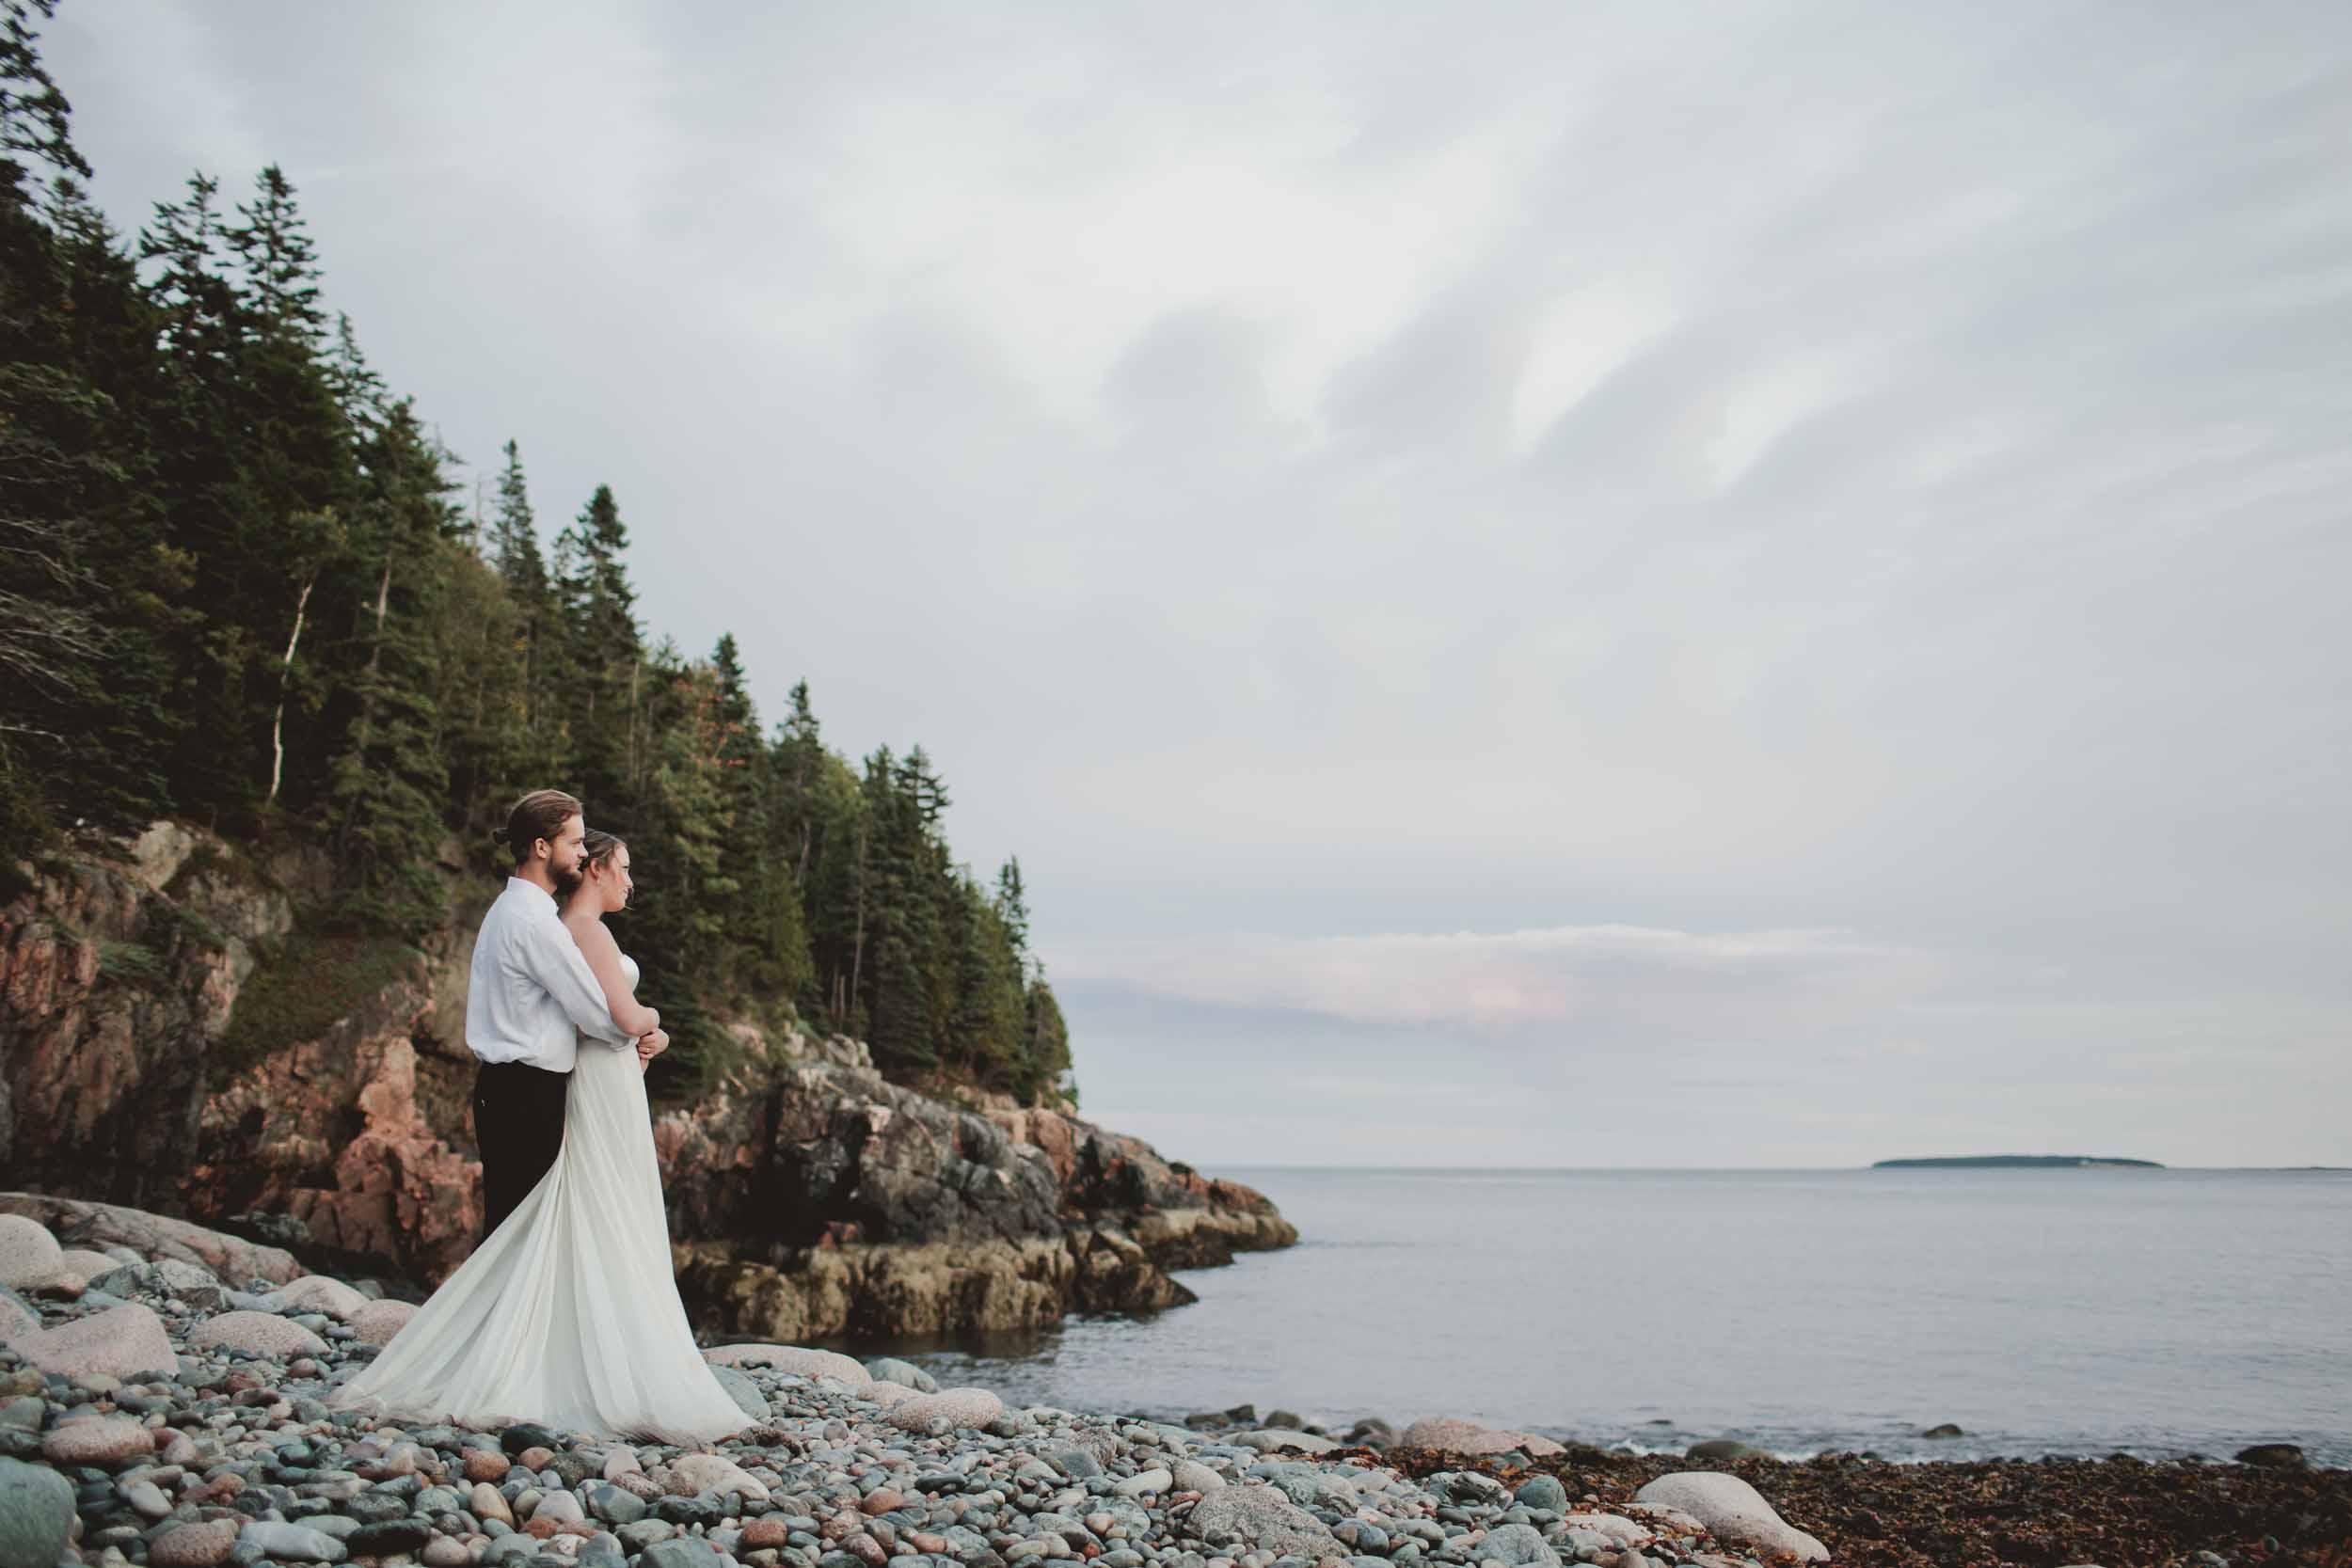 Maine-Elopement-Photographer36.jpg